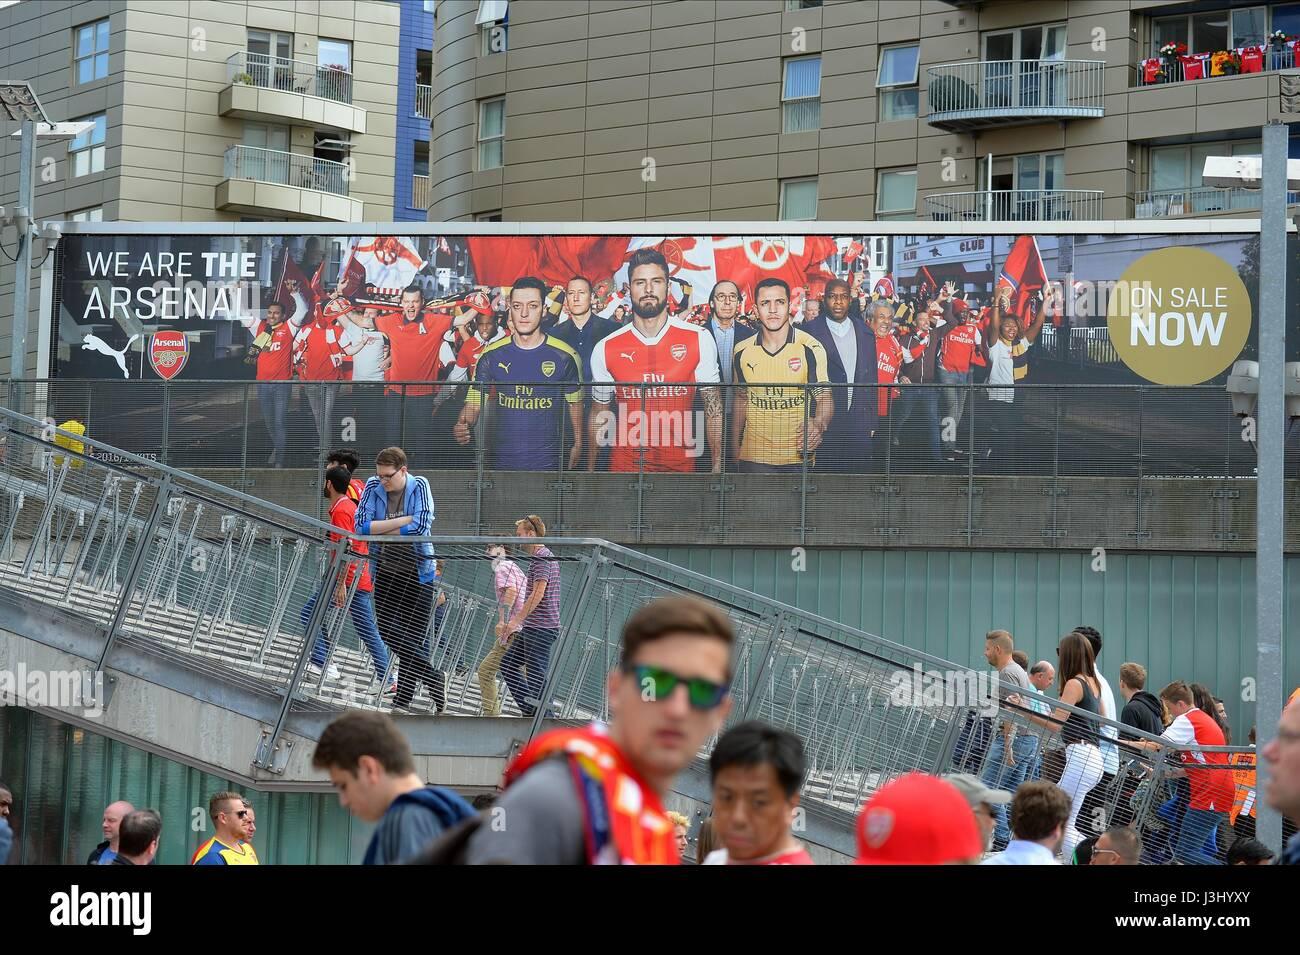 PICTURES OUTSIDE ARSENAL'S EMI ARSENAL V LIVERPOOL EMIRATES STADIUM LONDON ENGLAND 14 August 2016 - Stock Image